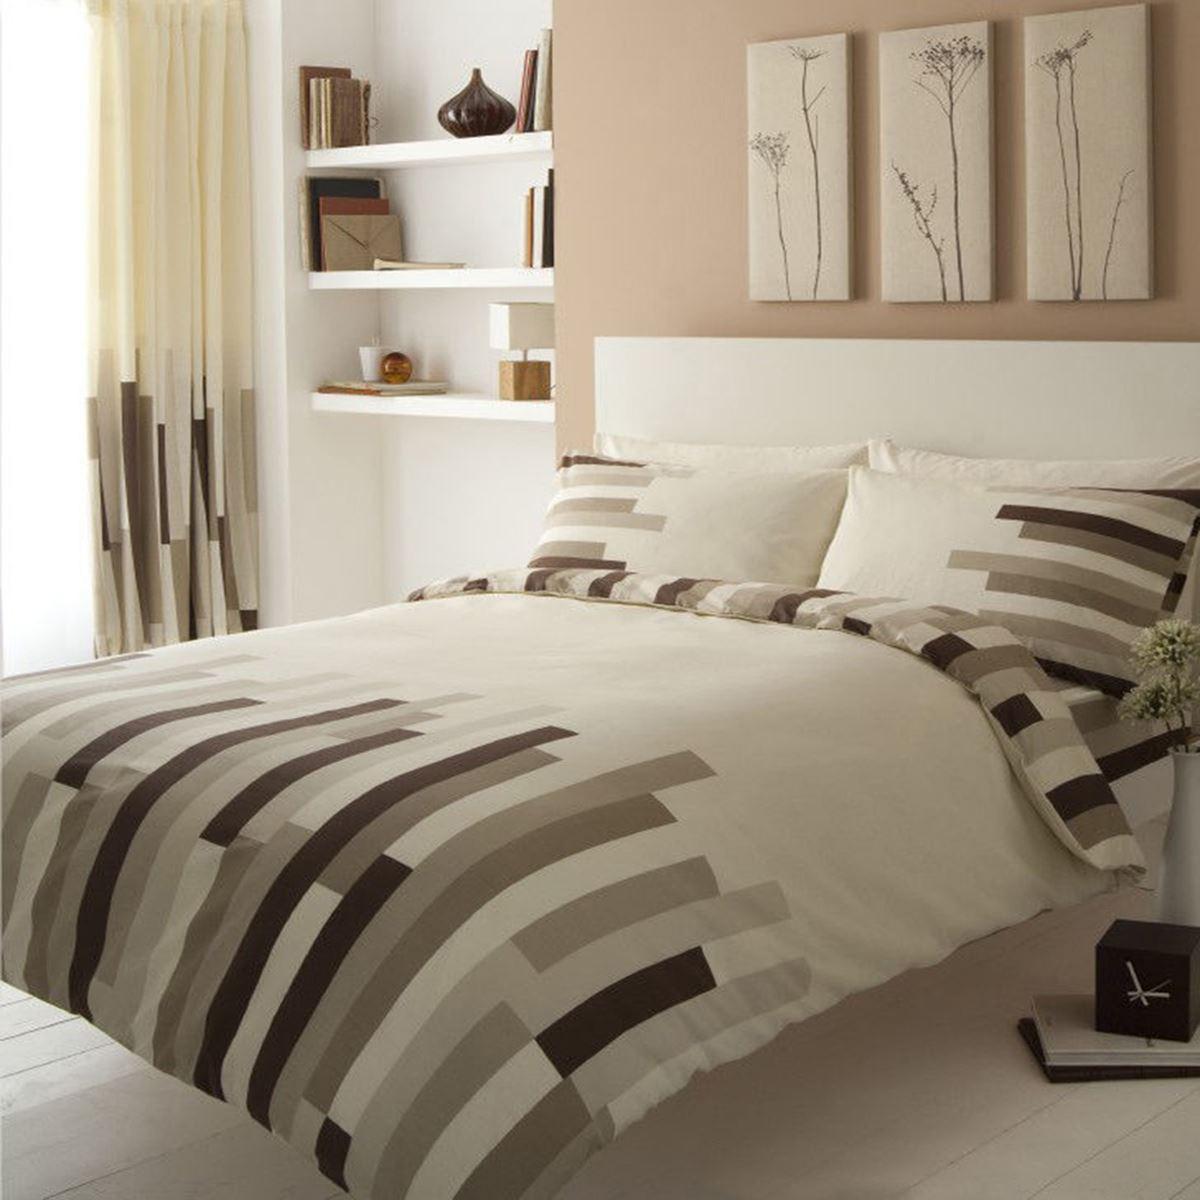 luxury duvet cover pillow case quilt cover bed set. Black Bedroom Furniture Sets. Home Design Ideas